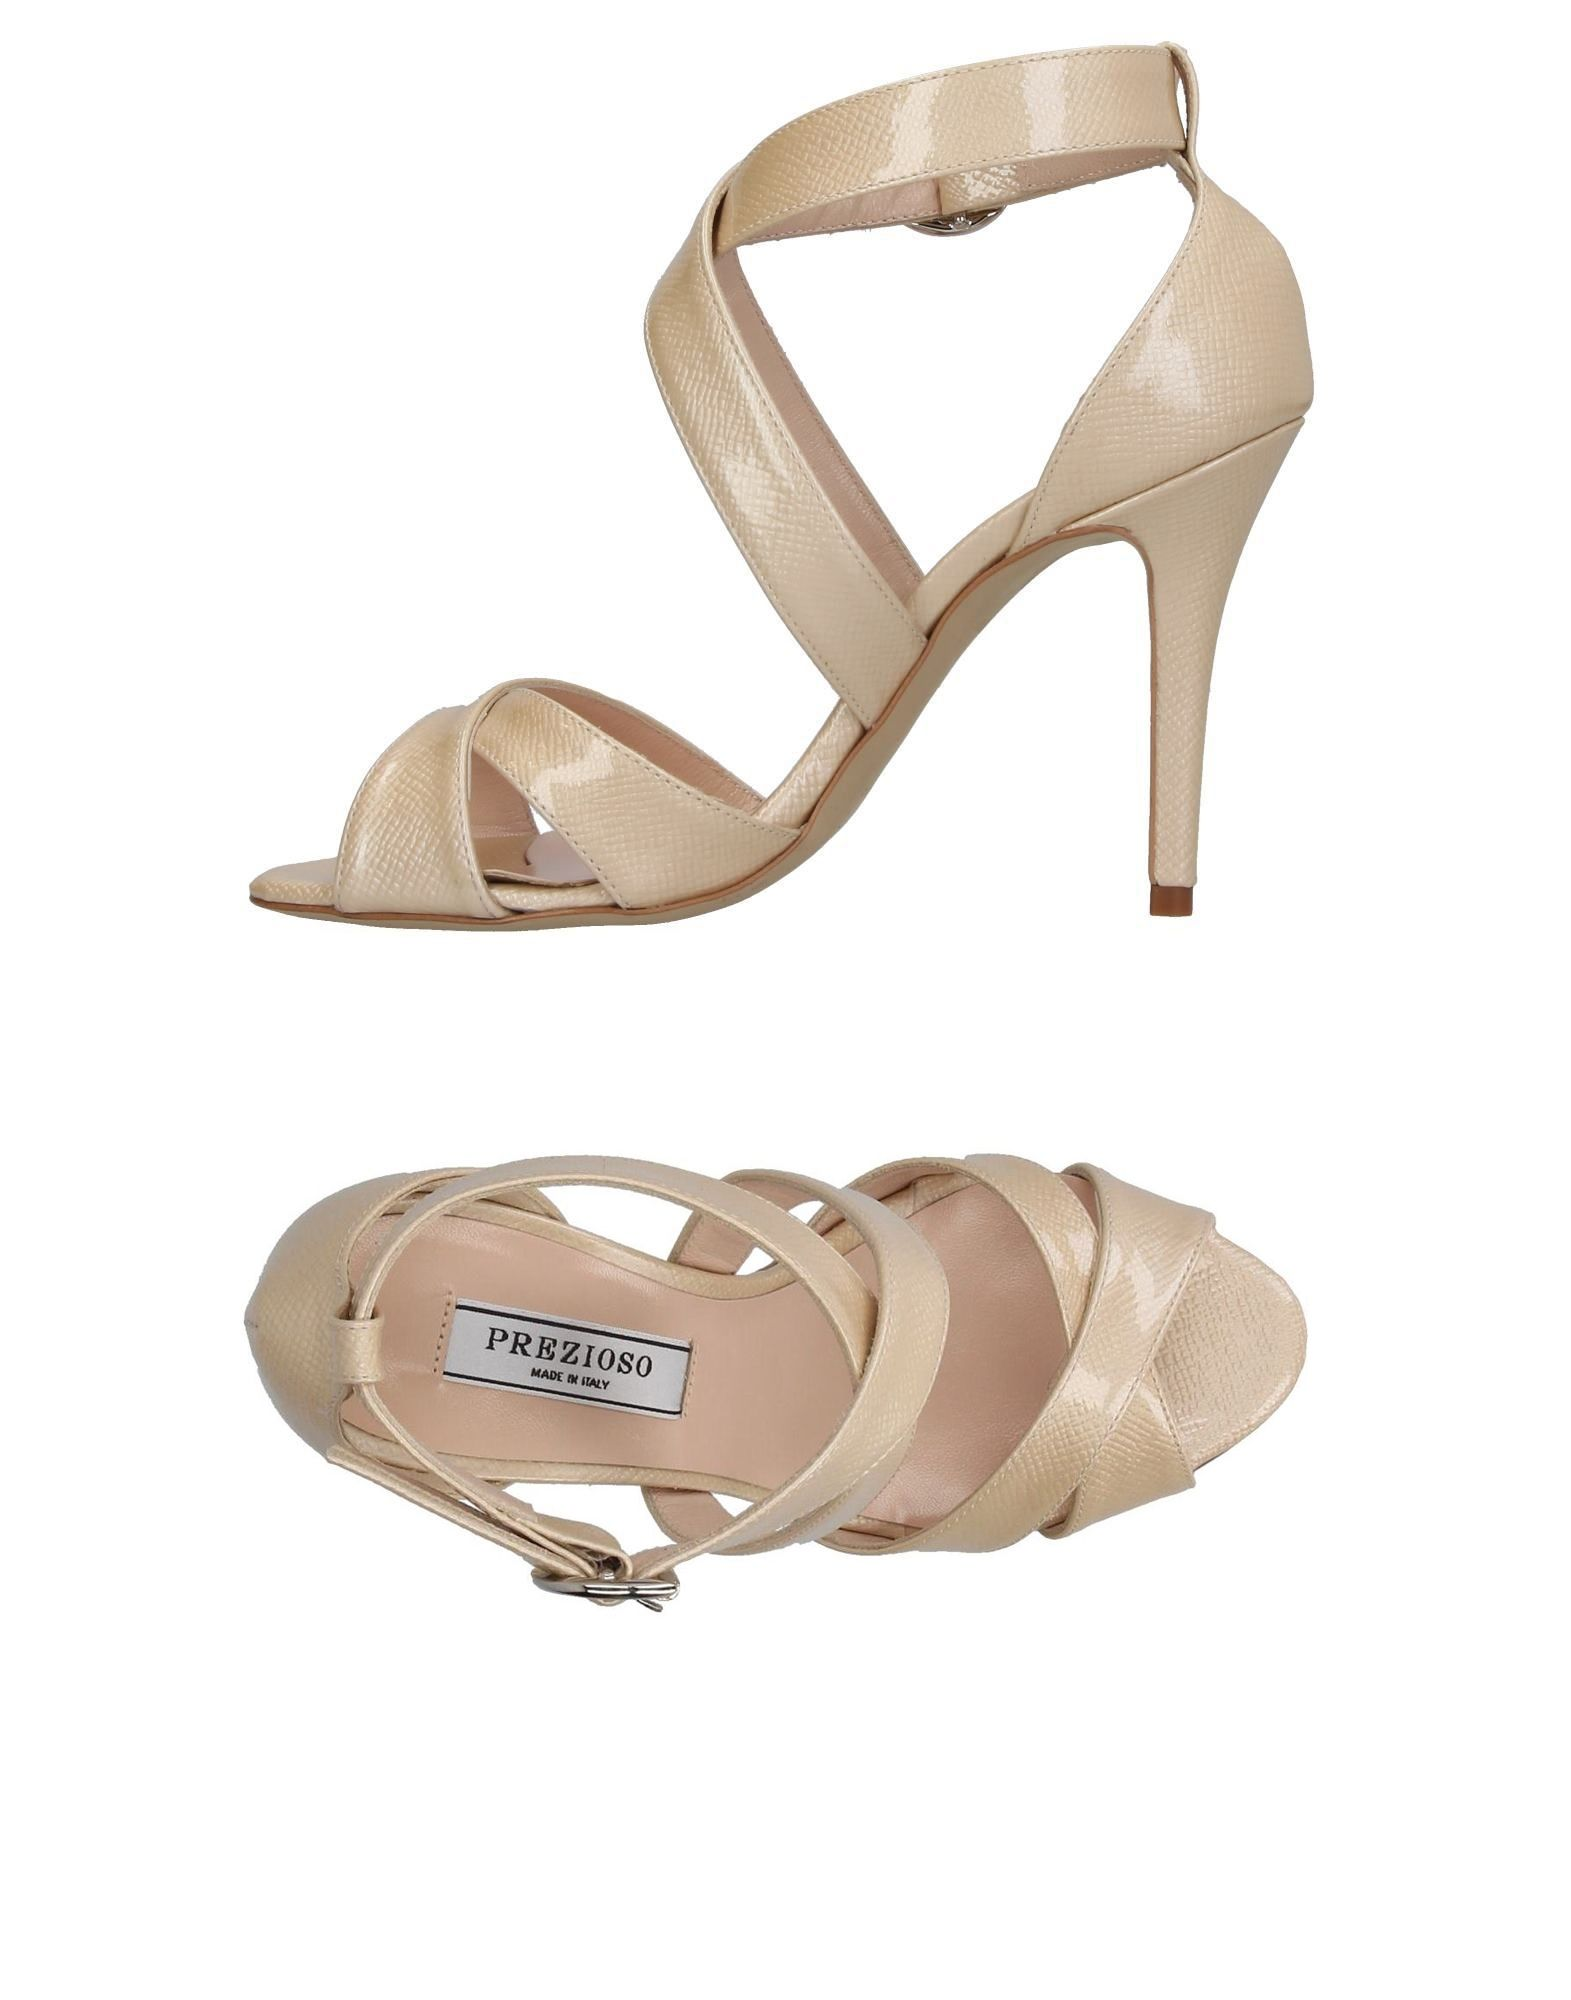 Moda Sandali Prezioso Donna - 11414495BR